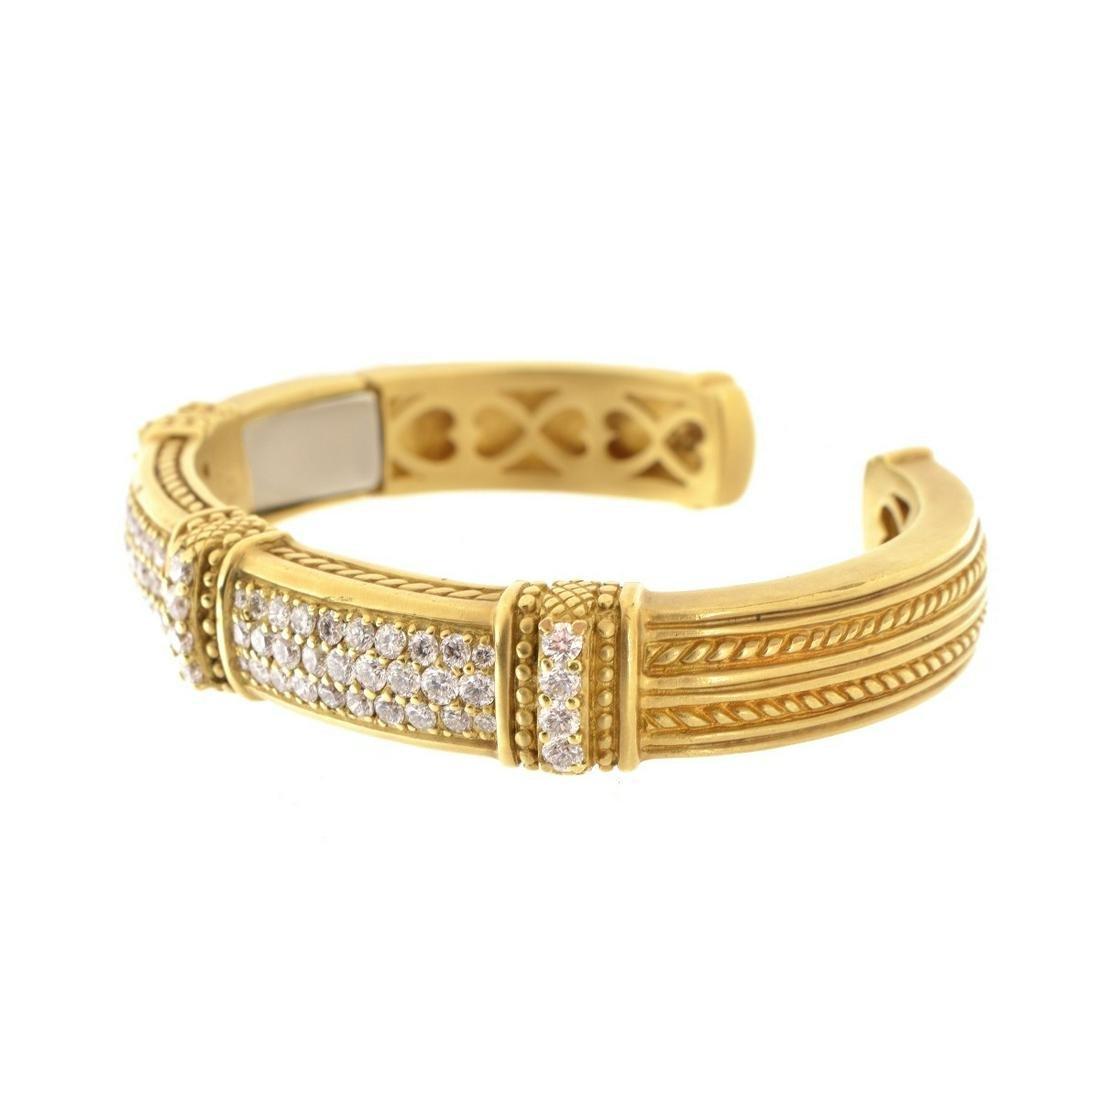 Judith Ripka Diamond and 18K Bracelet